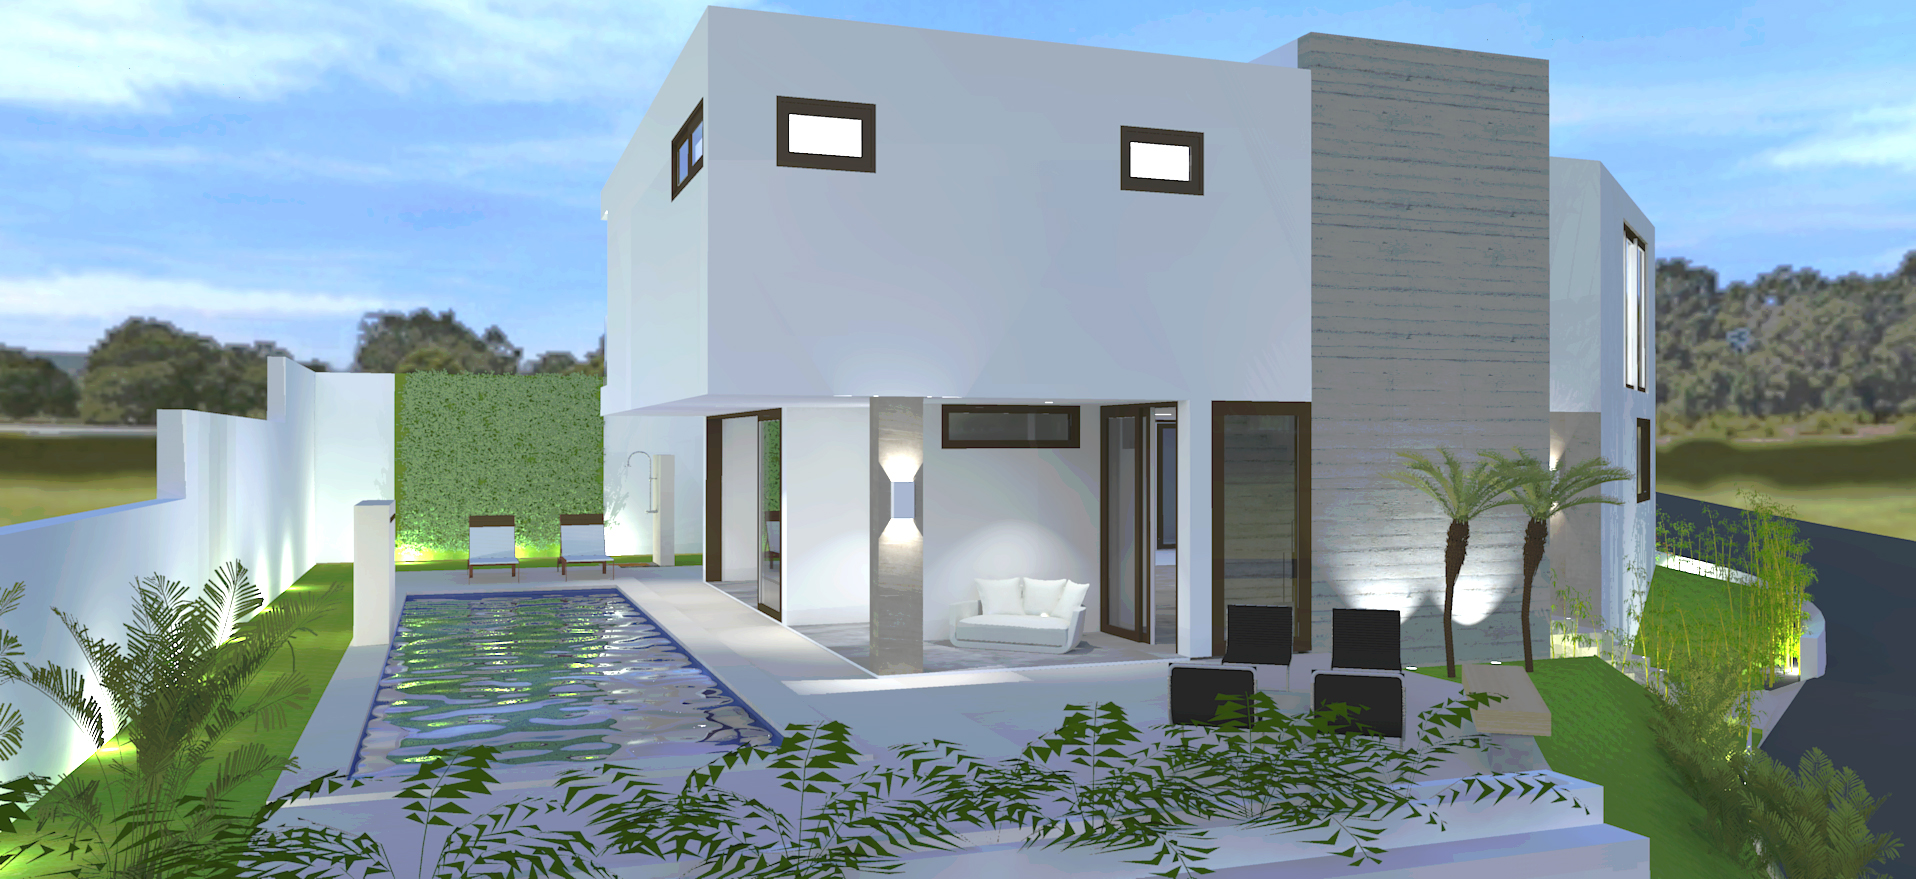 midrie-arquitetura-Residencia1_v3.jpg